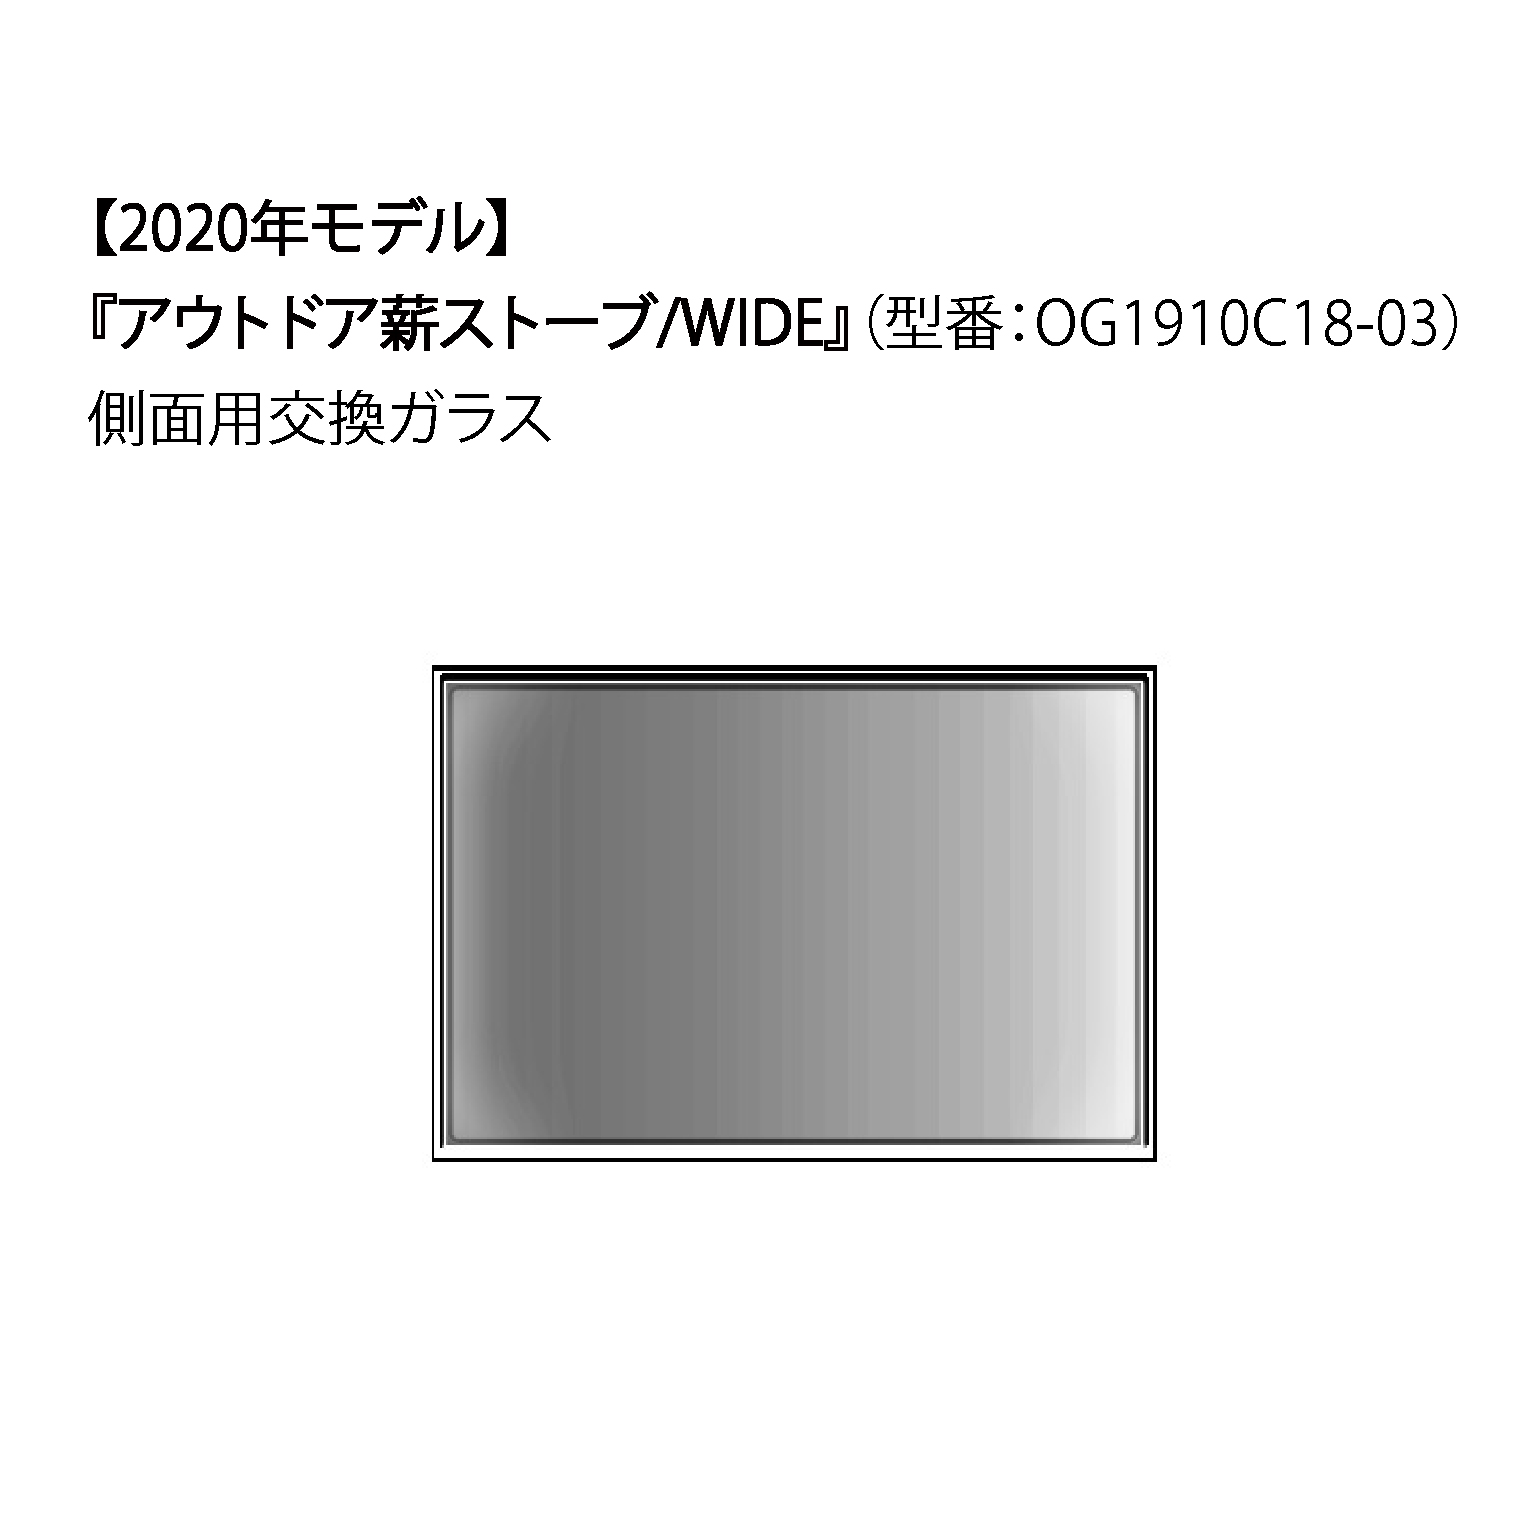 Locomo WIDE ストーブ 交換ガラス ( 側面 )